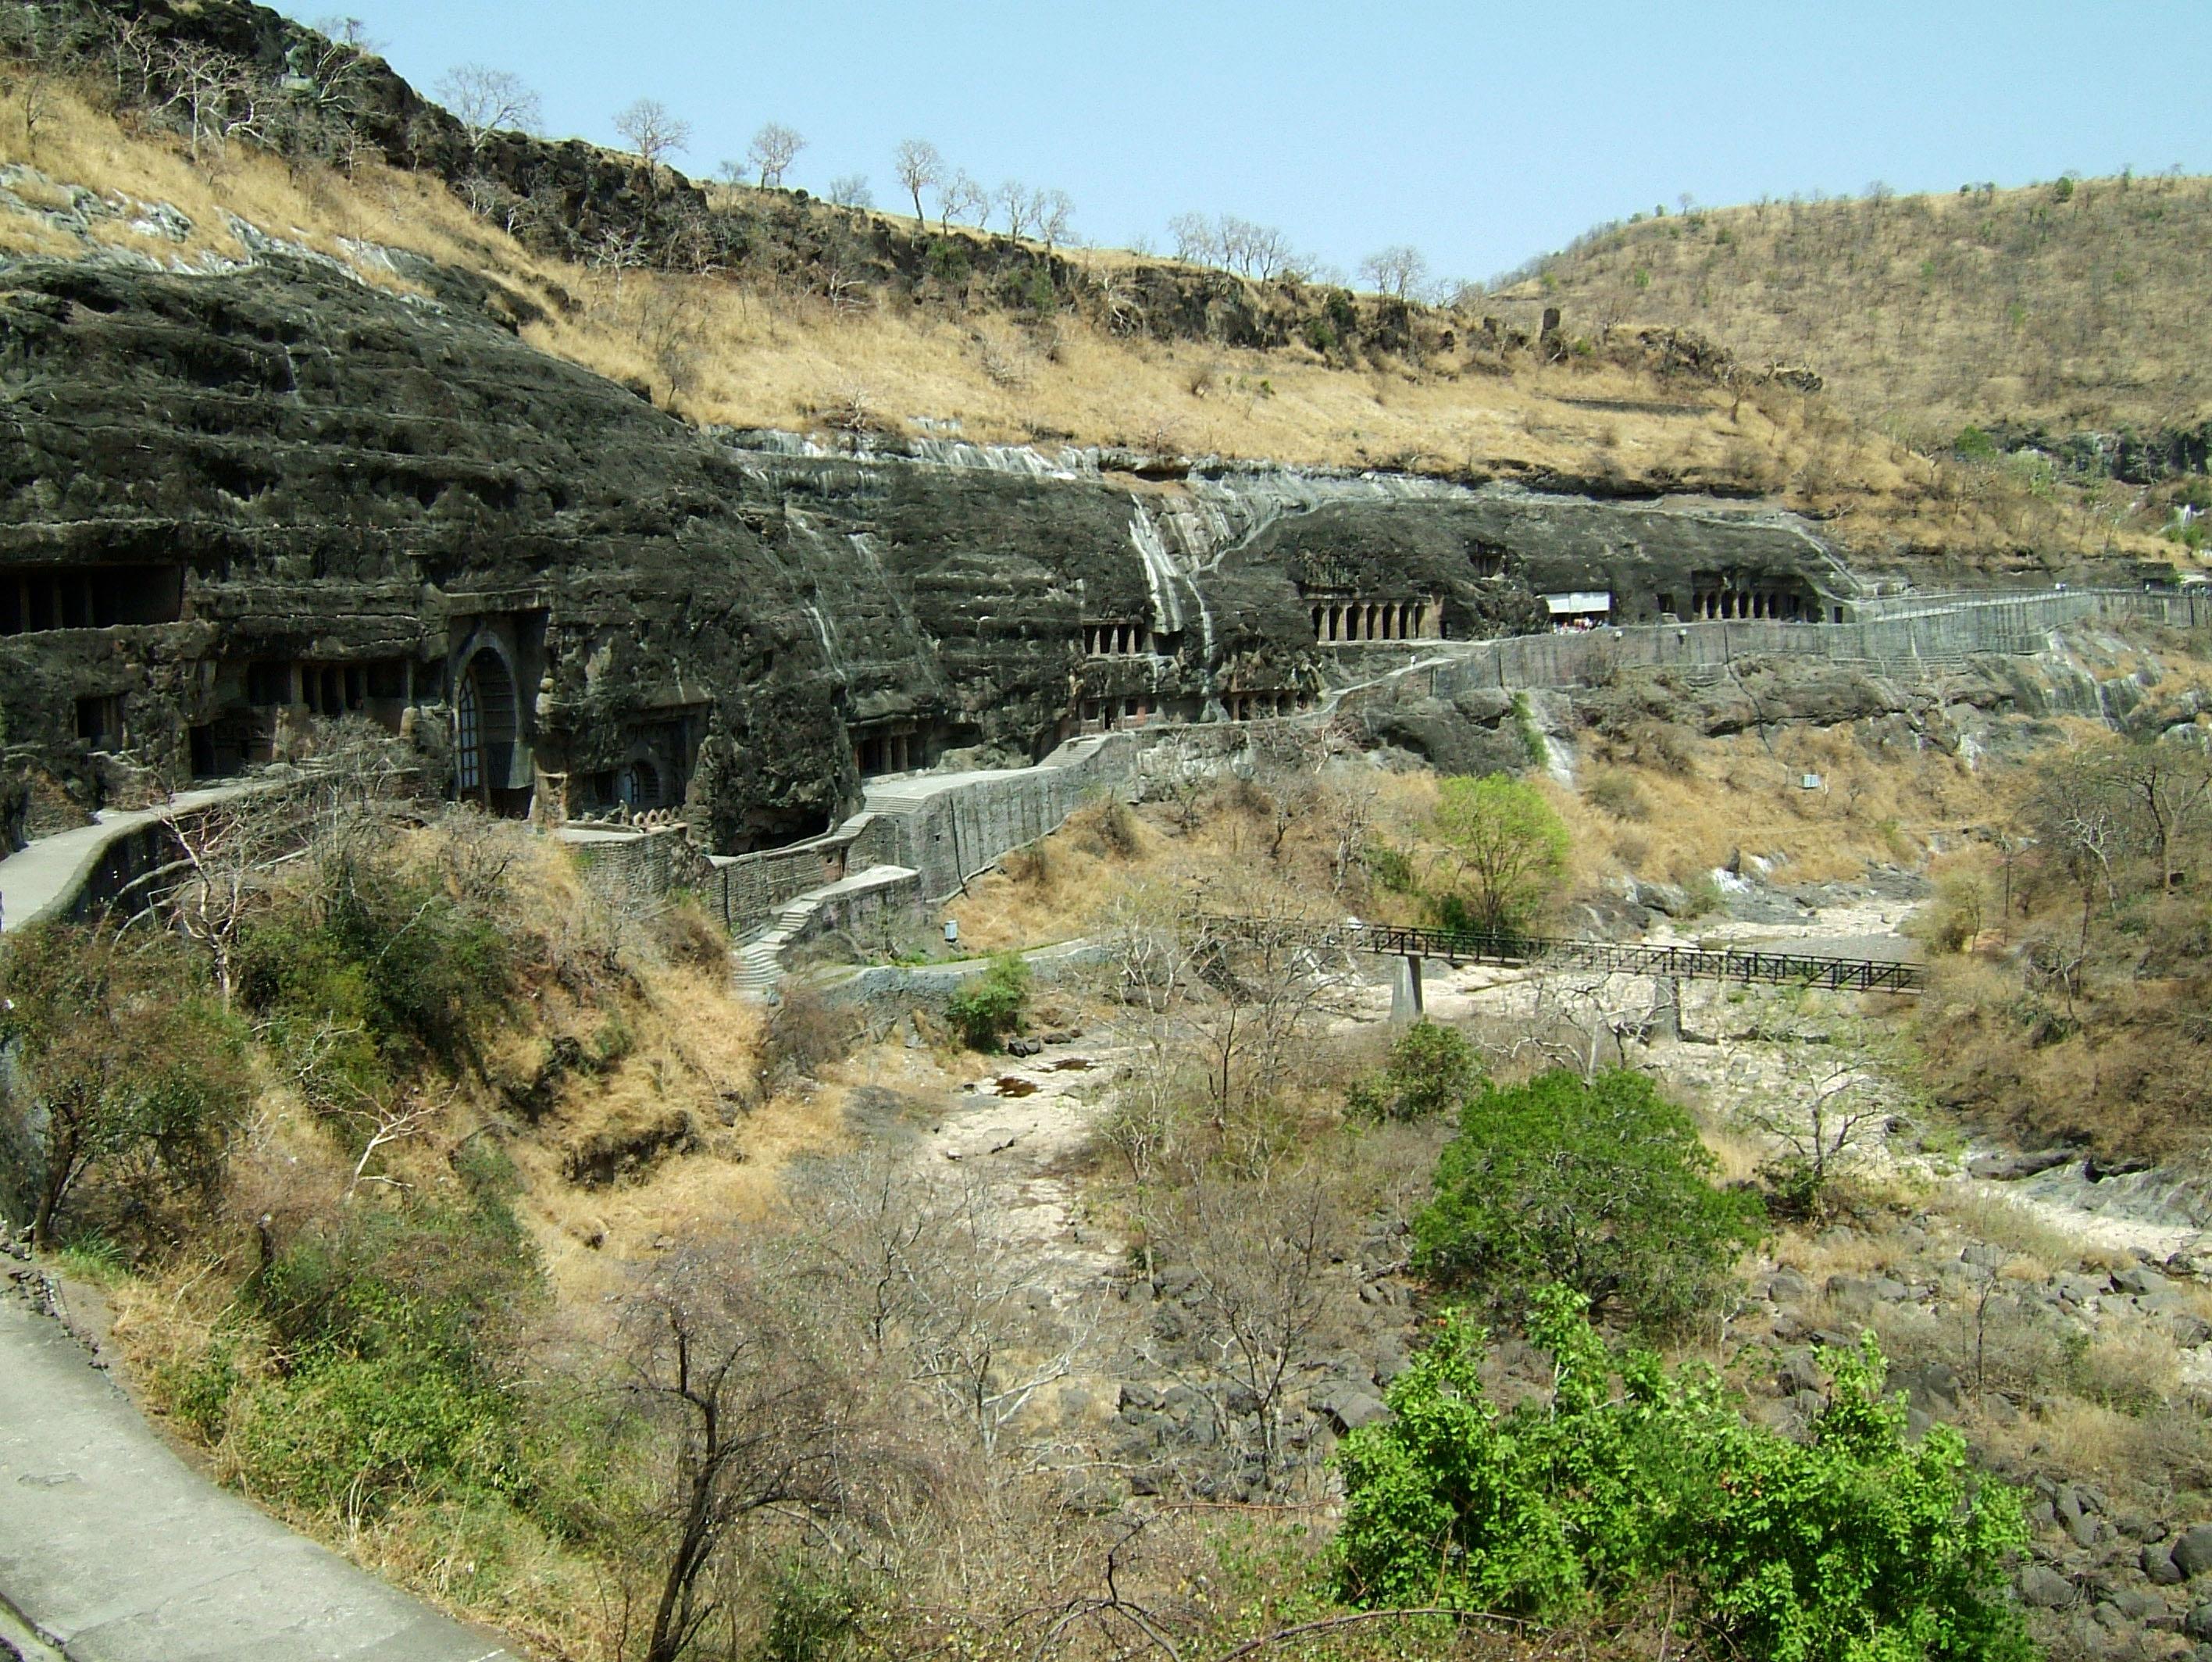 Marathwada Ajanta Caves entrance India Apr 2004 03